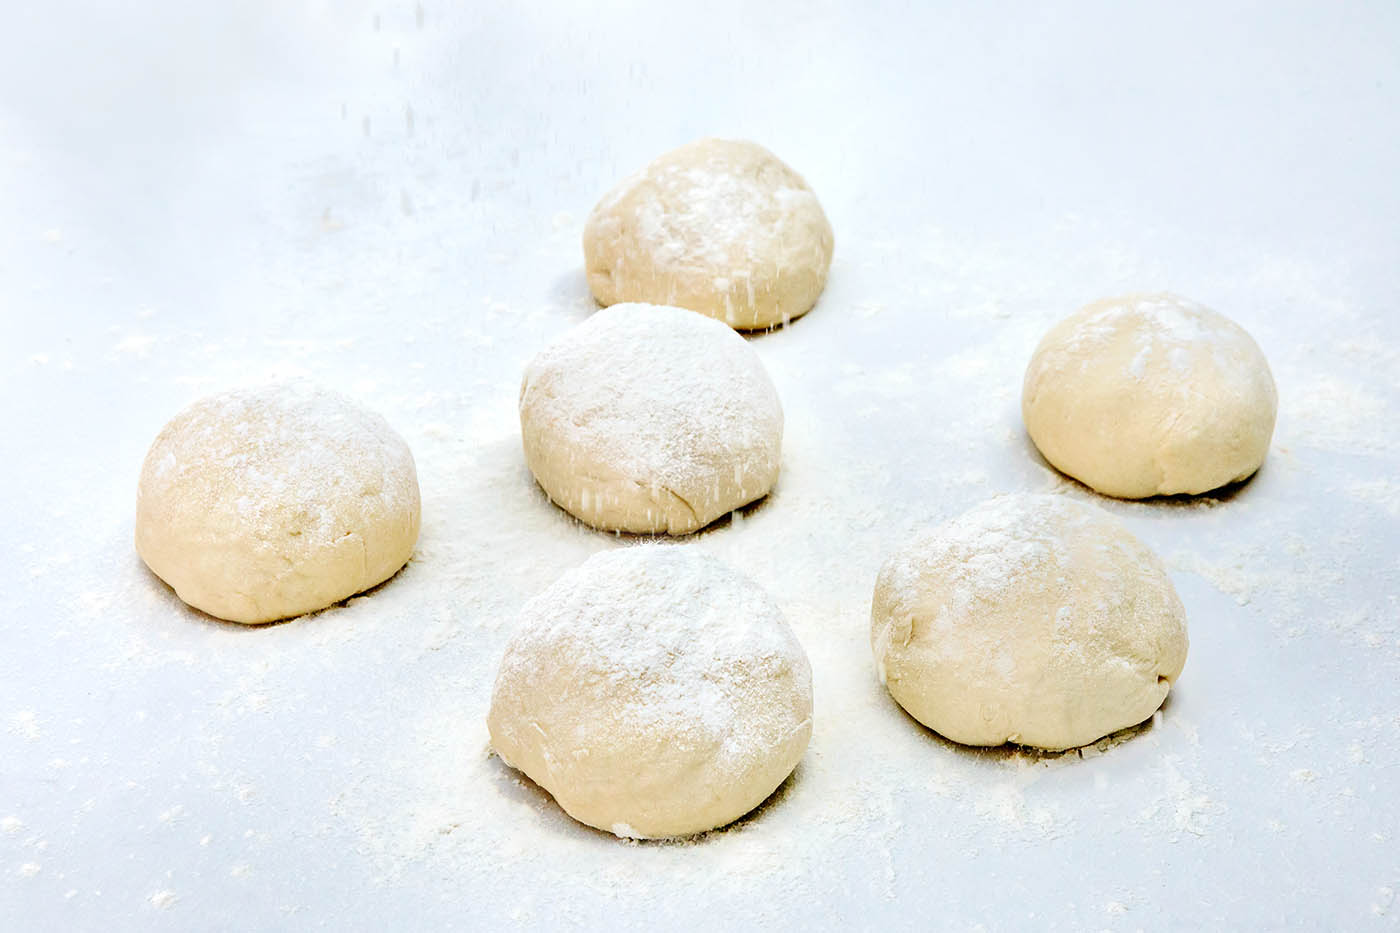 How To Make Neapolitan Pizza Dough